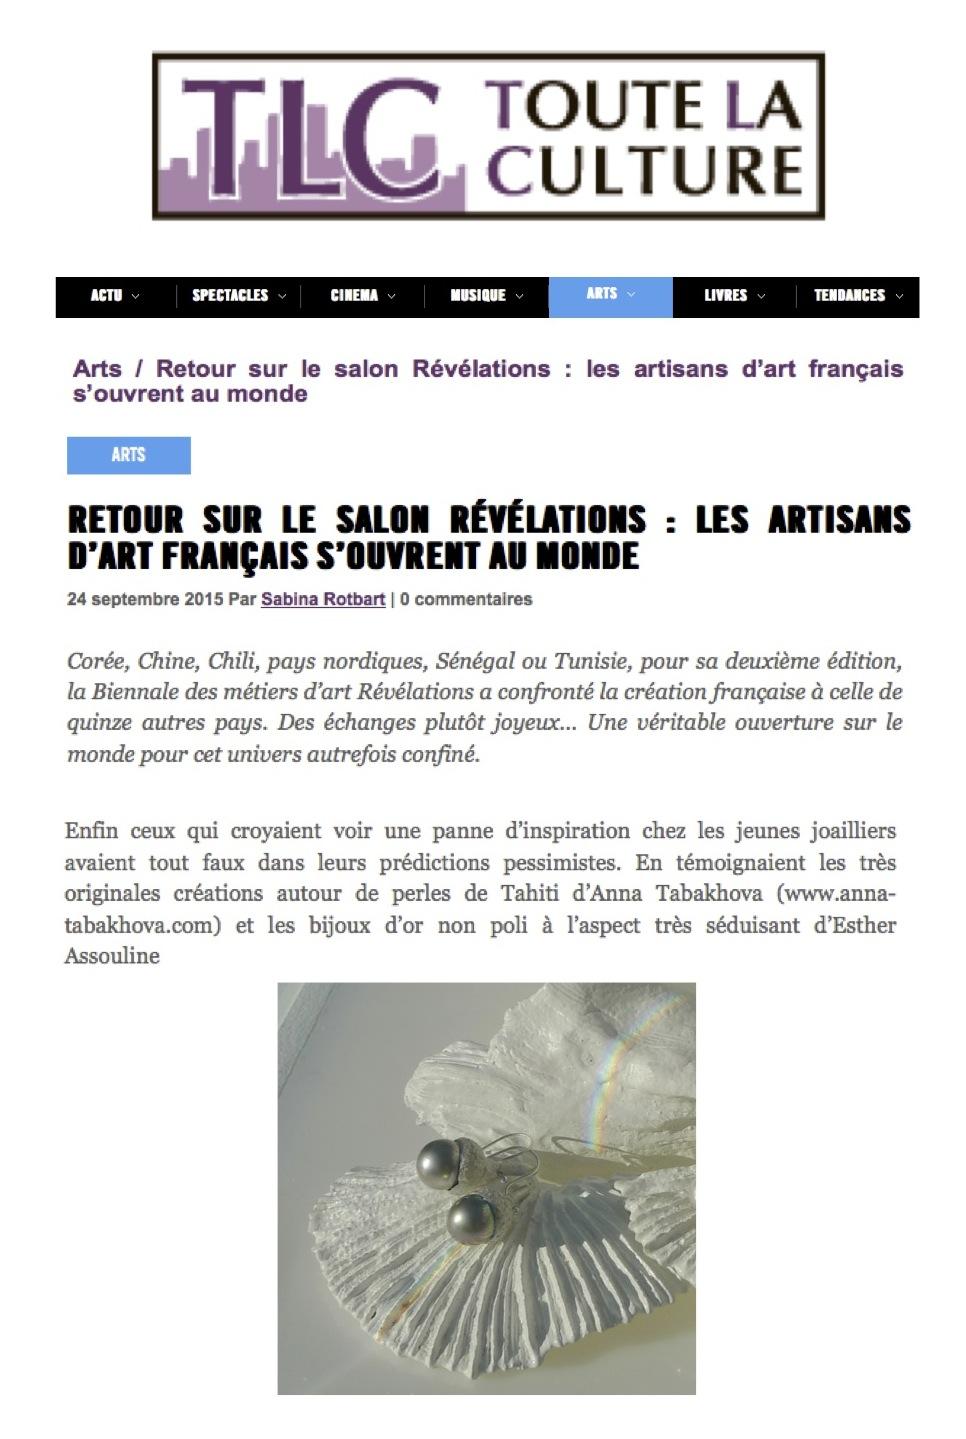 anna tabakhova Paris presse toutelaculture